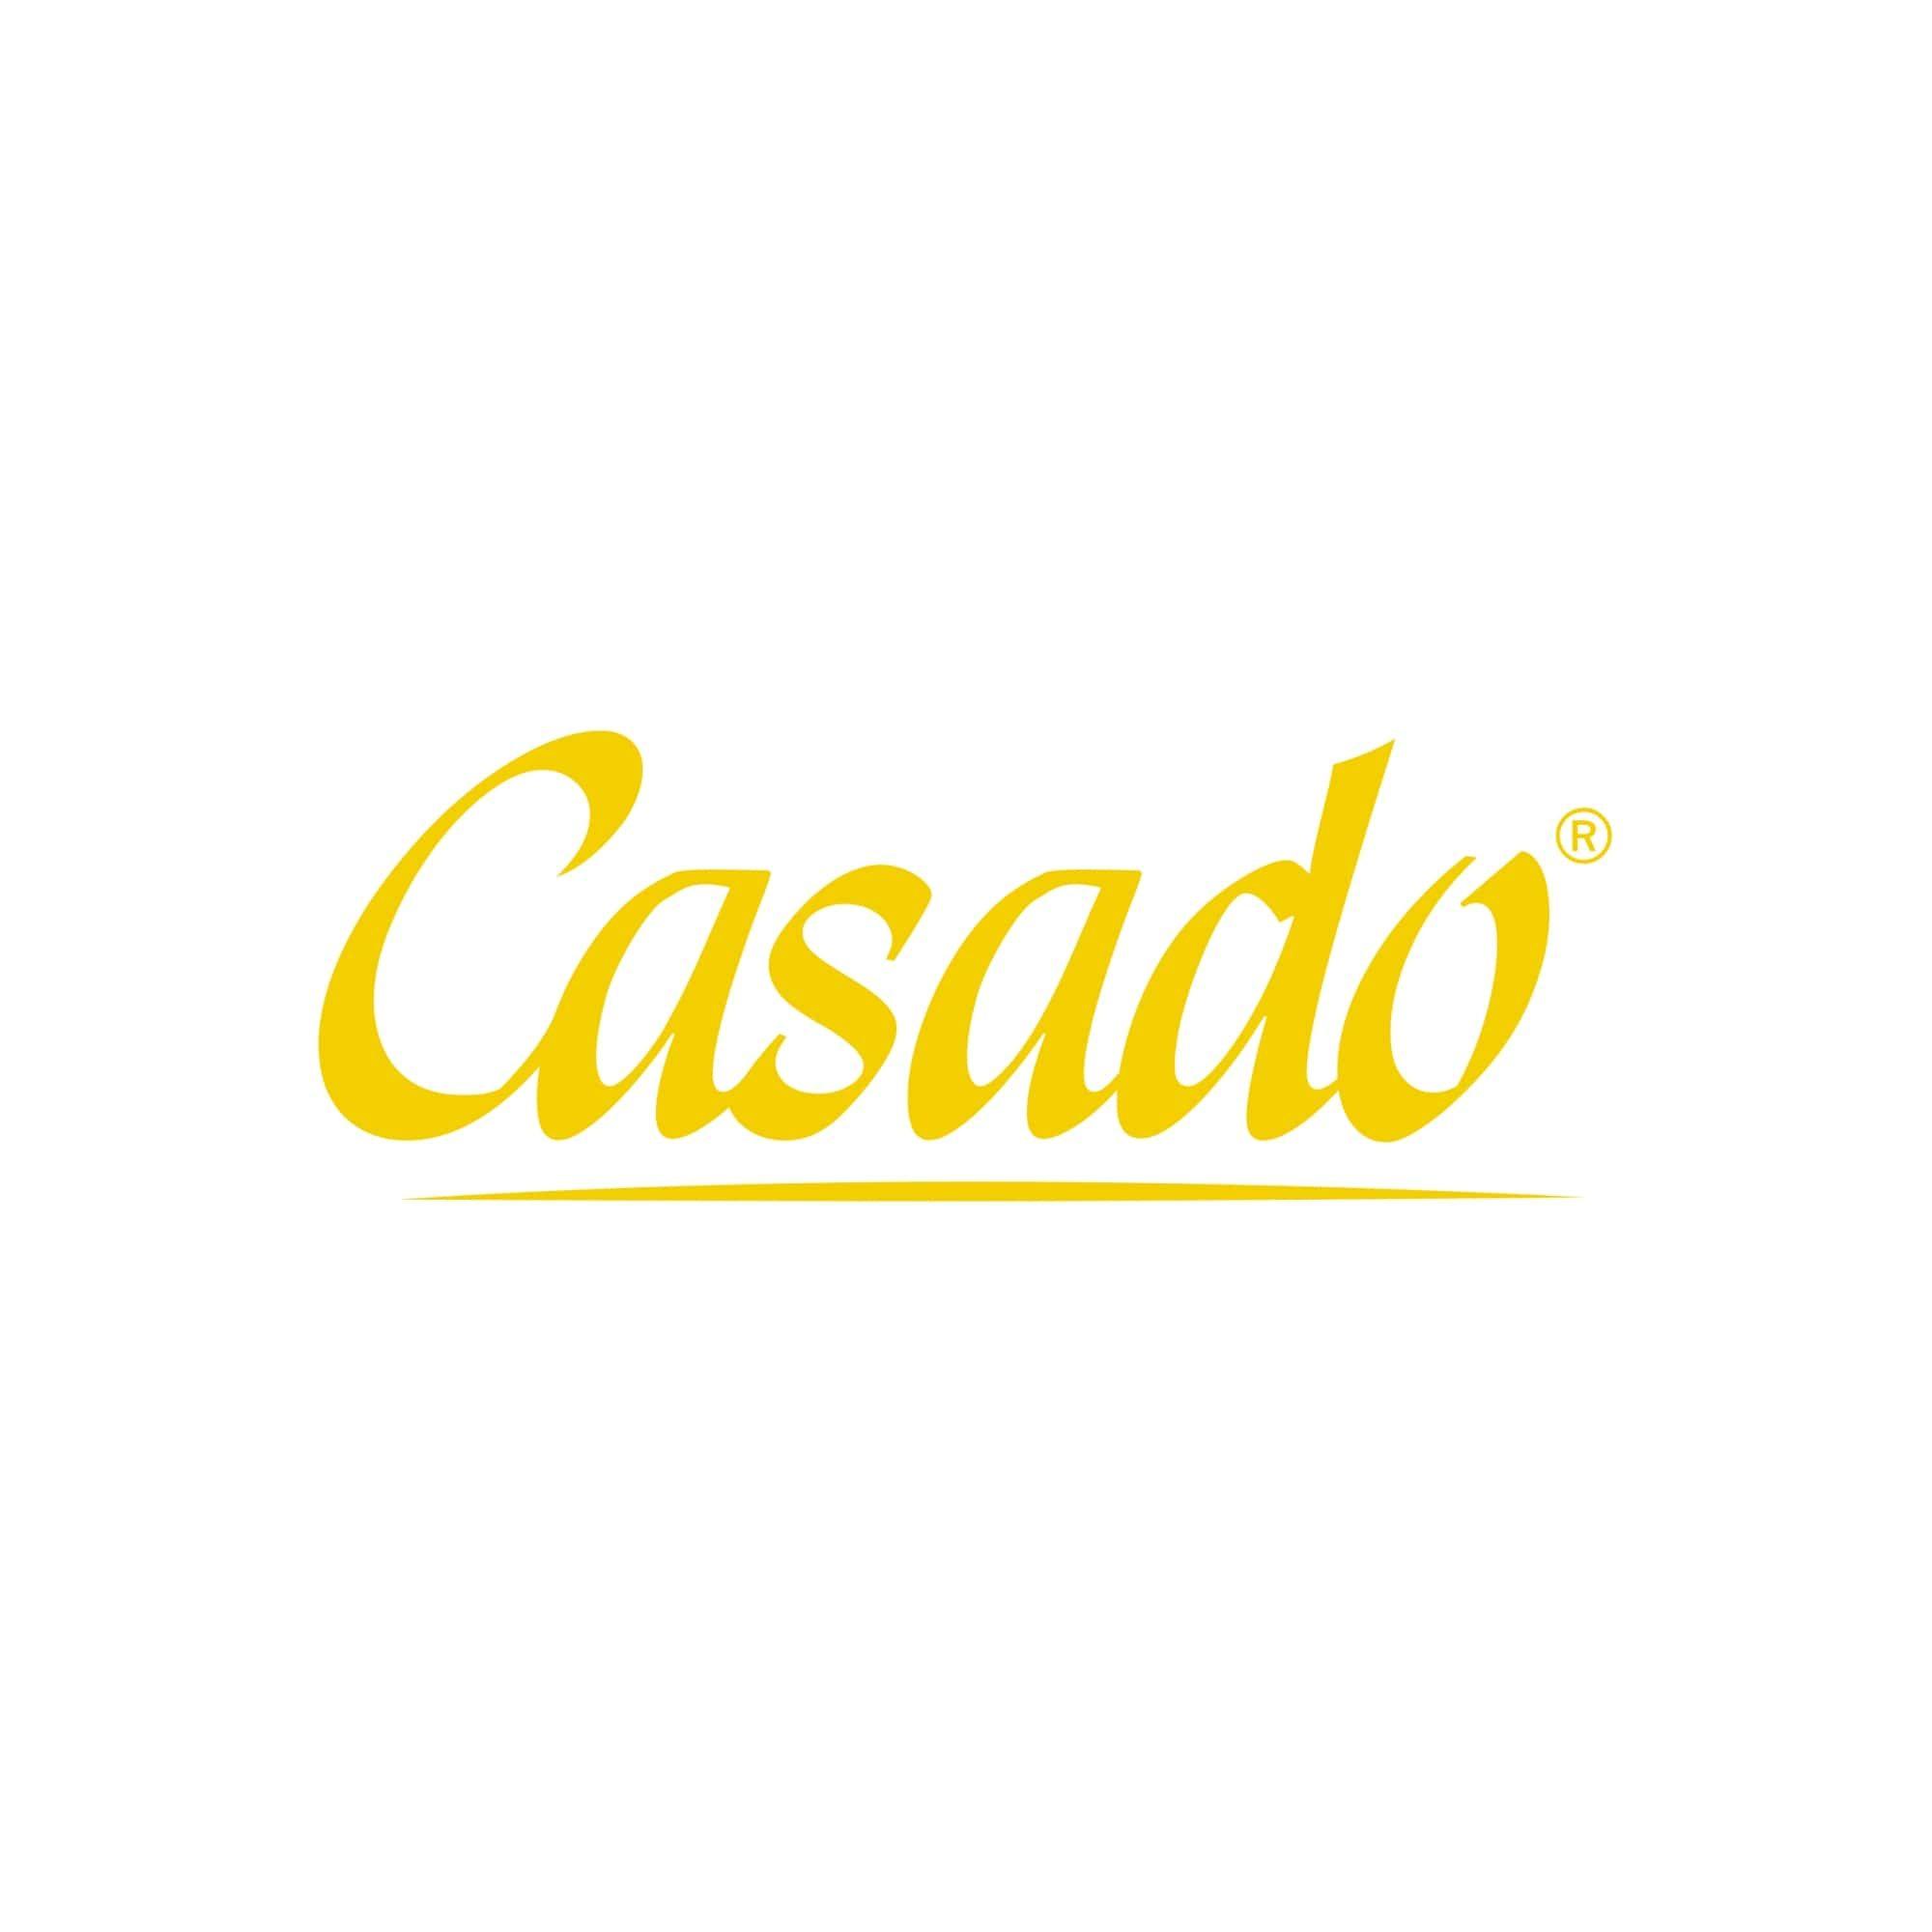 Casado-ou3lngtesnynxjsivwvgav1ocepmtpyvynjnekbg2o